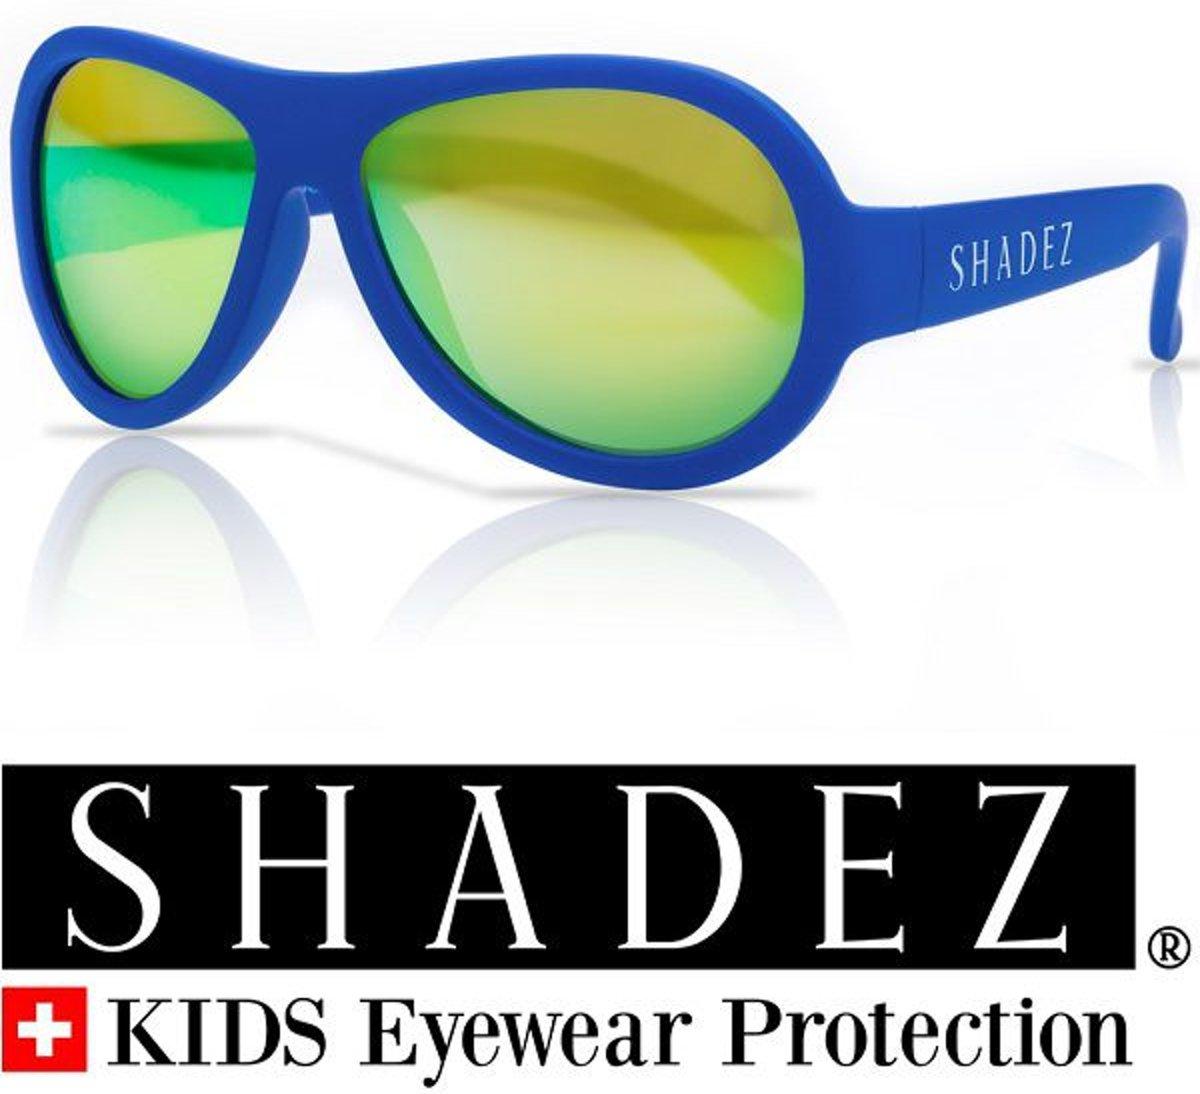 Zonnebril baby & peuter - Kinder zonnebril - Shadez - Blauw 0-3 jr